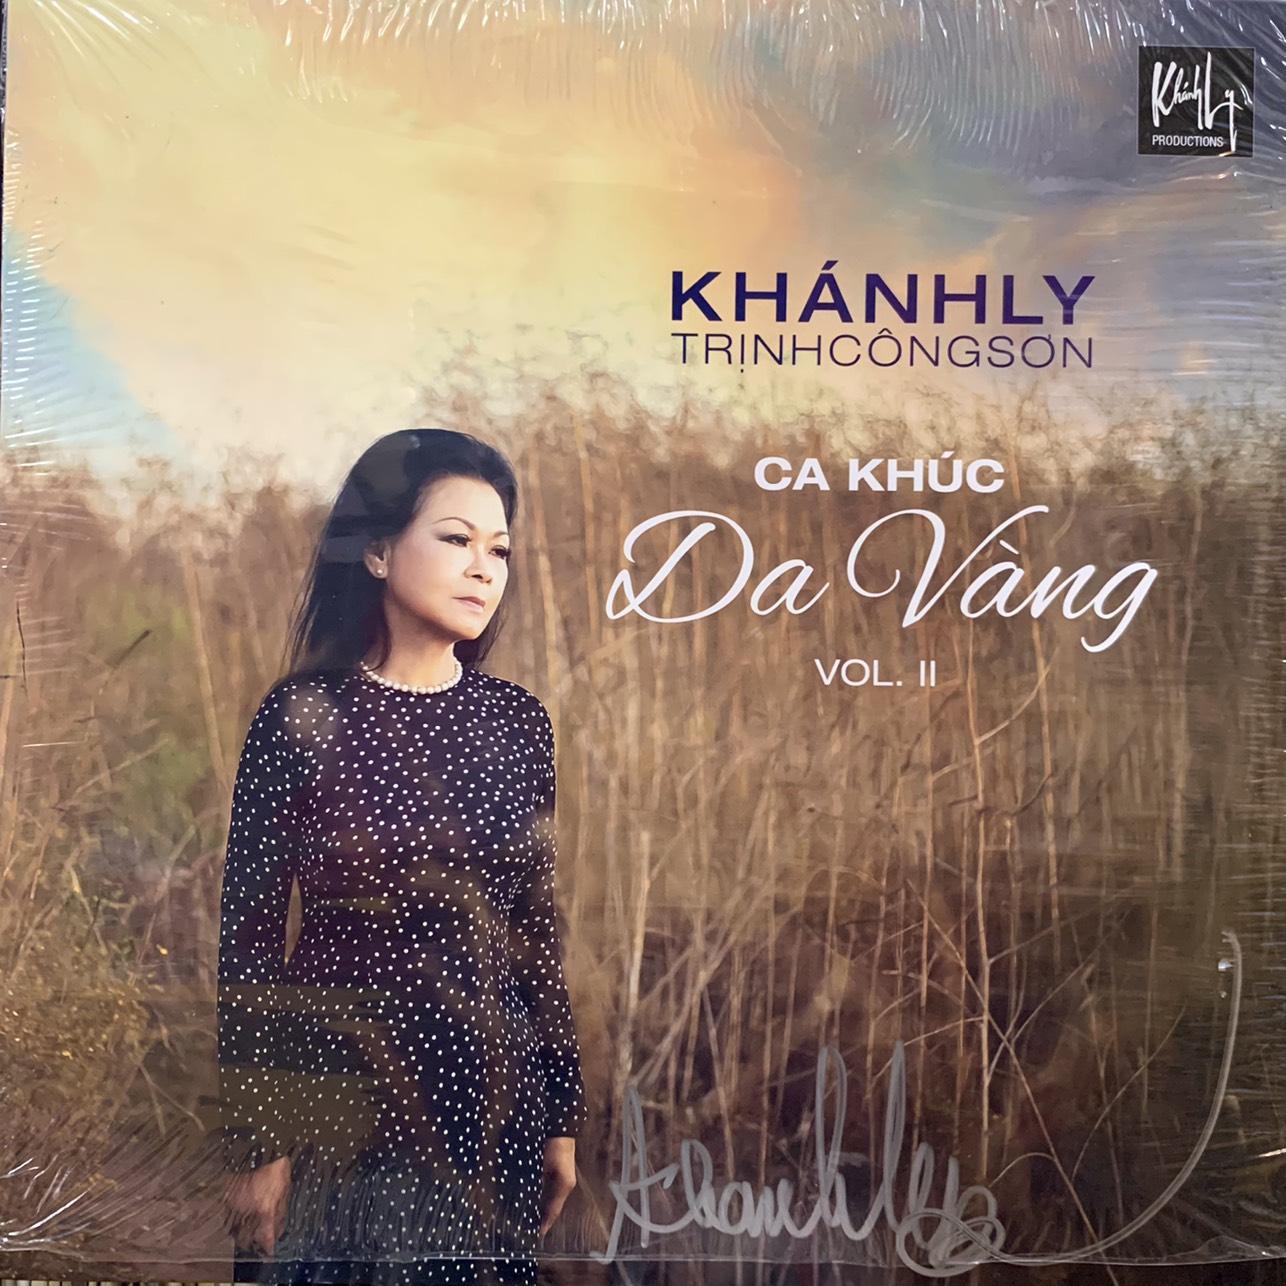 dia-than-ca-khuc-da-vang-vol-2-khanh-ky-trinh-cong-son